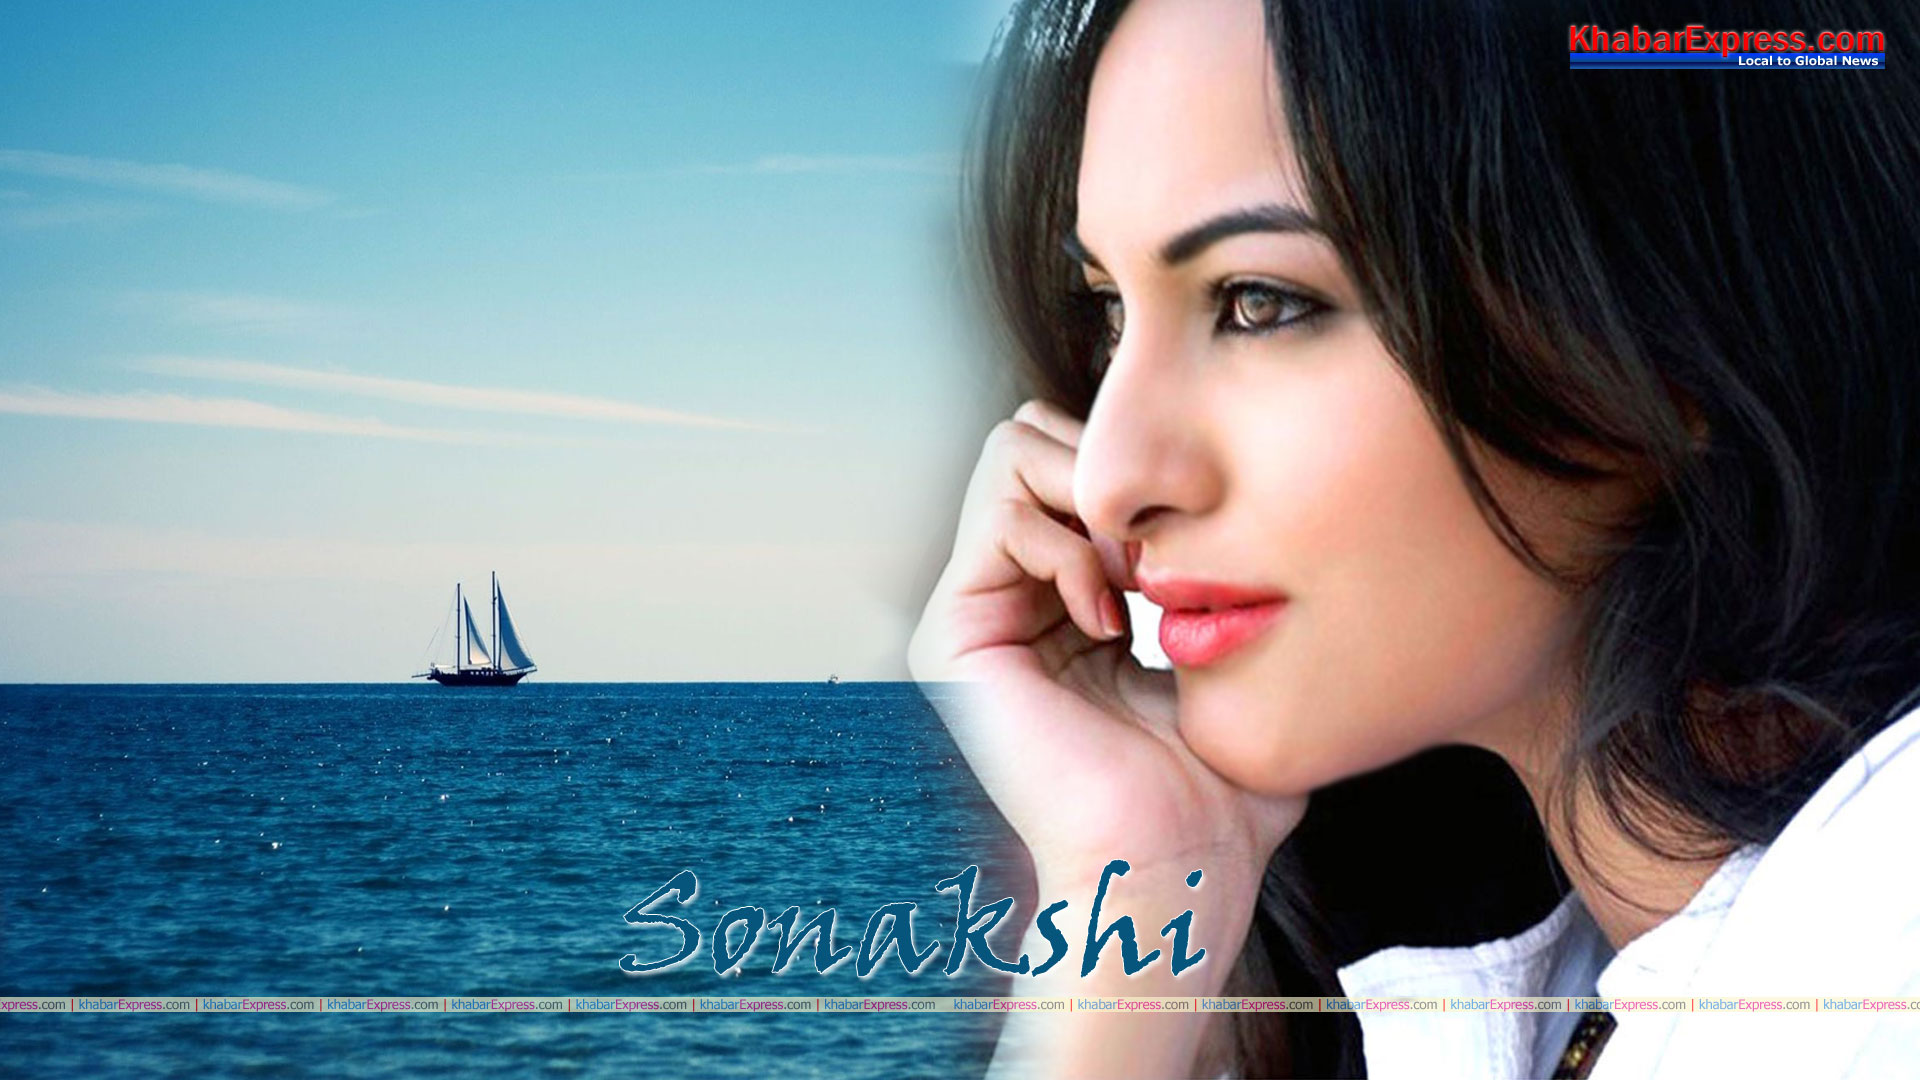 Bollywood Superstar Sonakshi Sinha